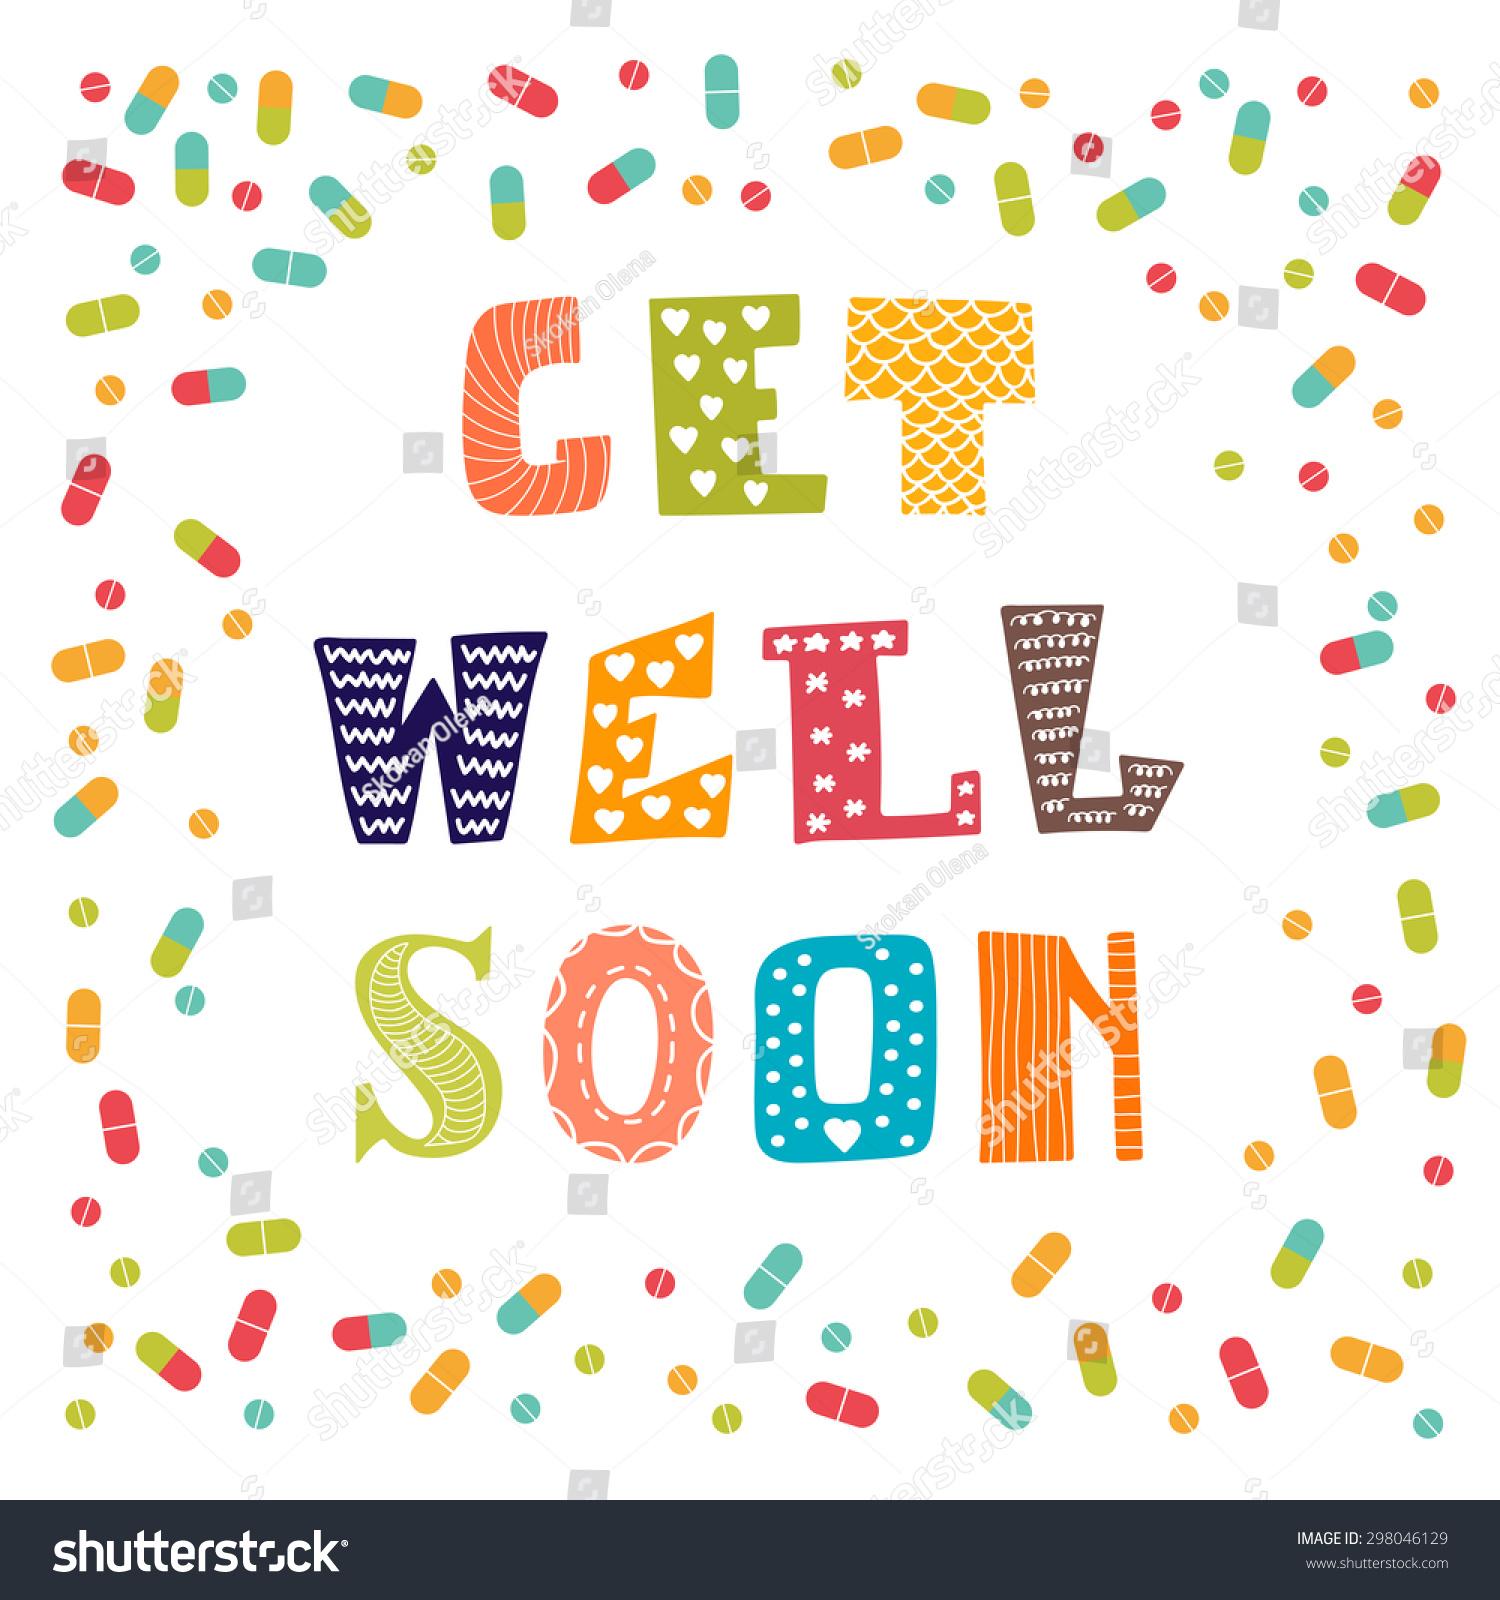 Get well soon card pills greeting stock vector 298046129 get well soon card with pills greeting card vector illustration kristyandbryce Gallery